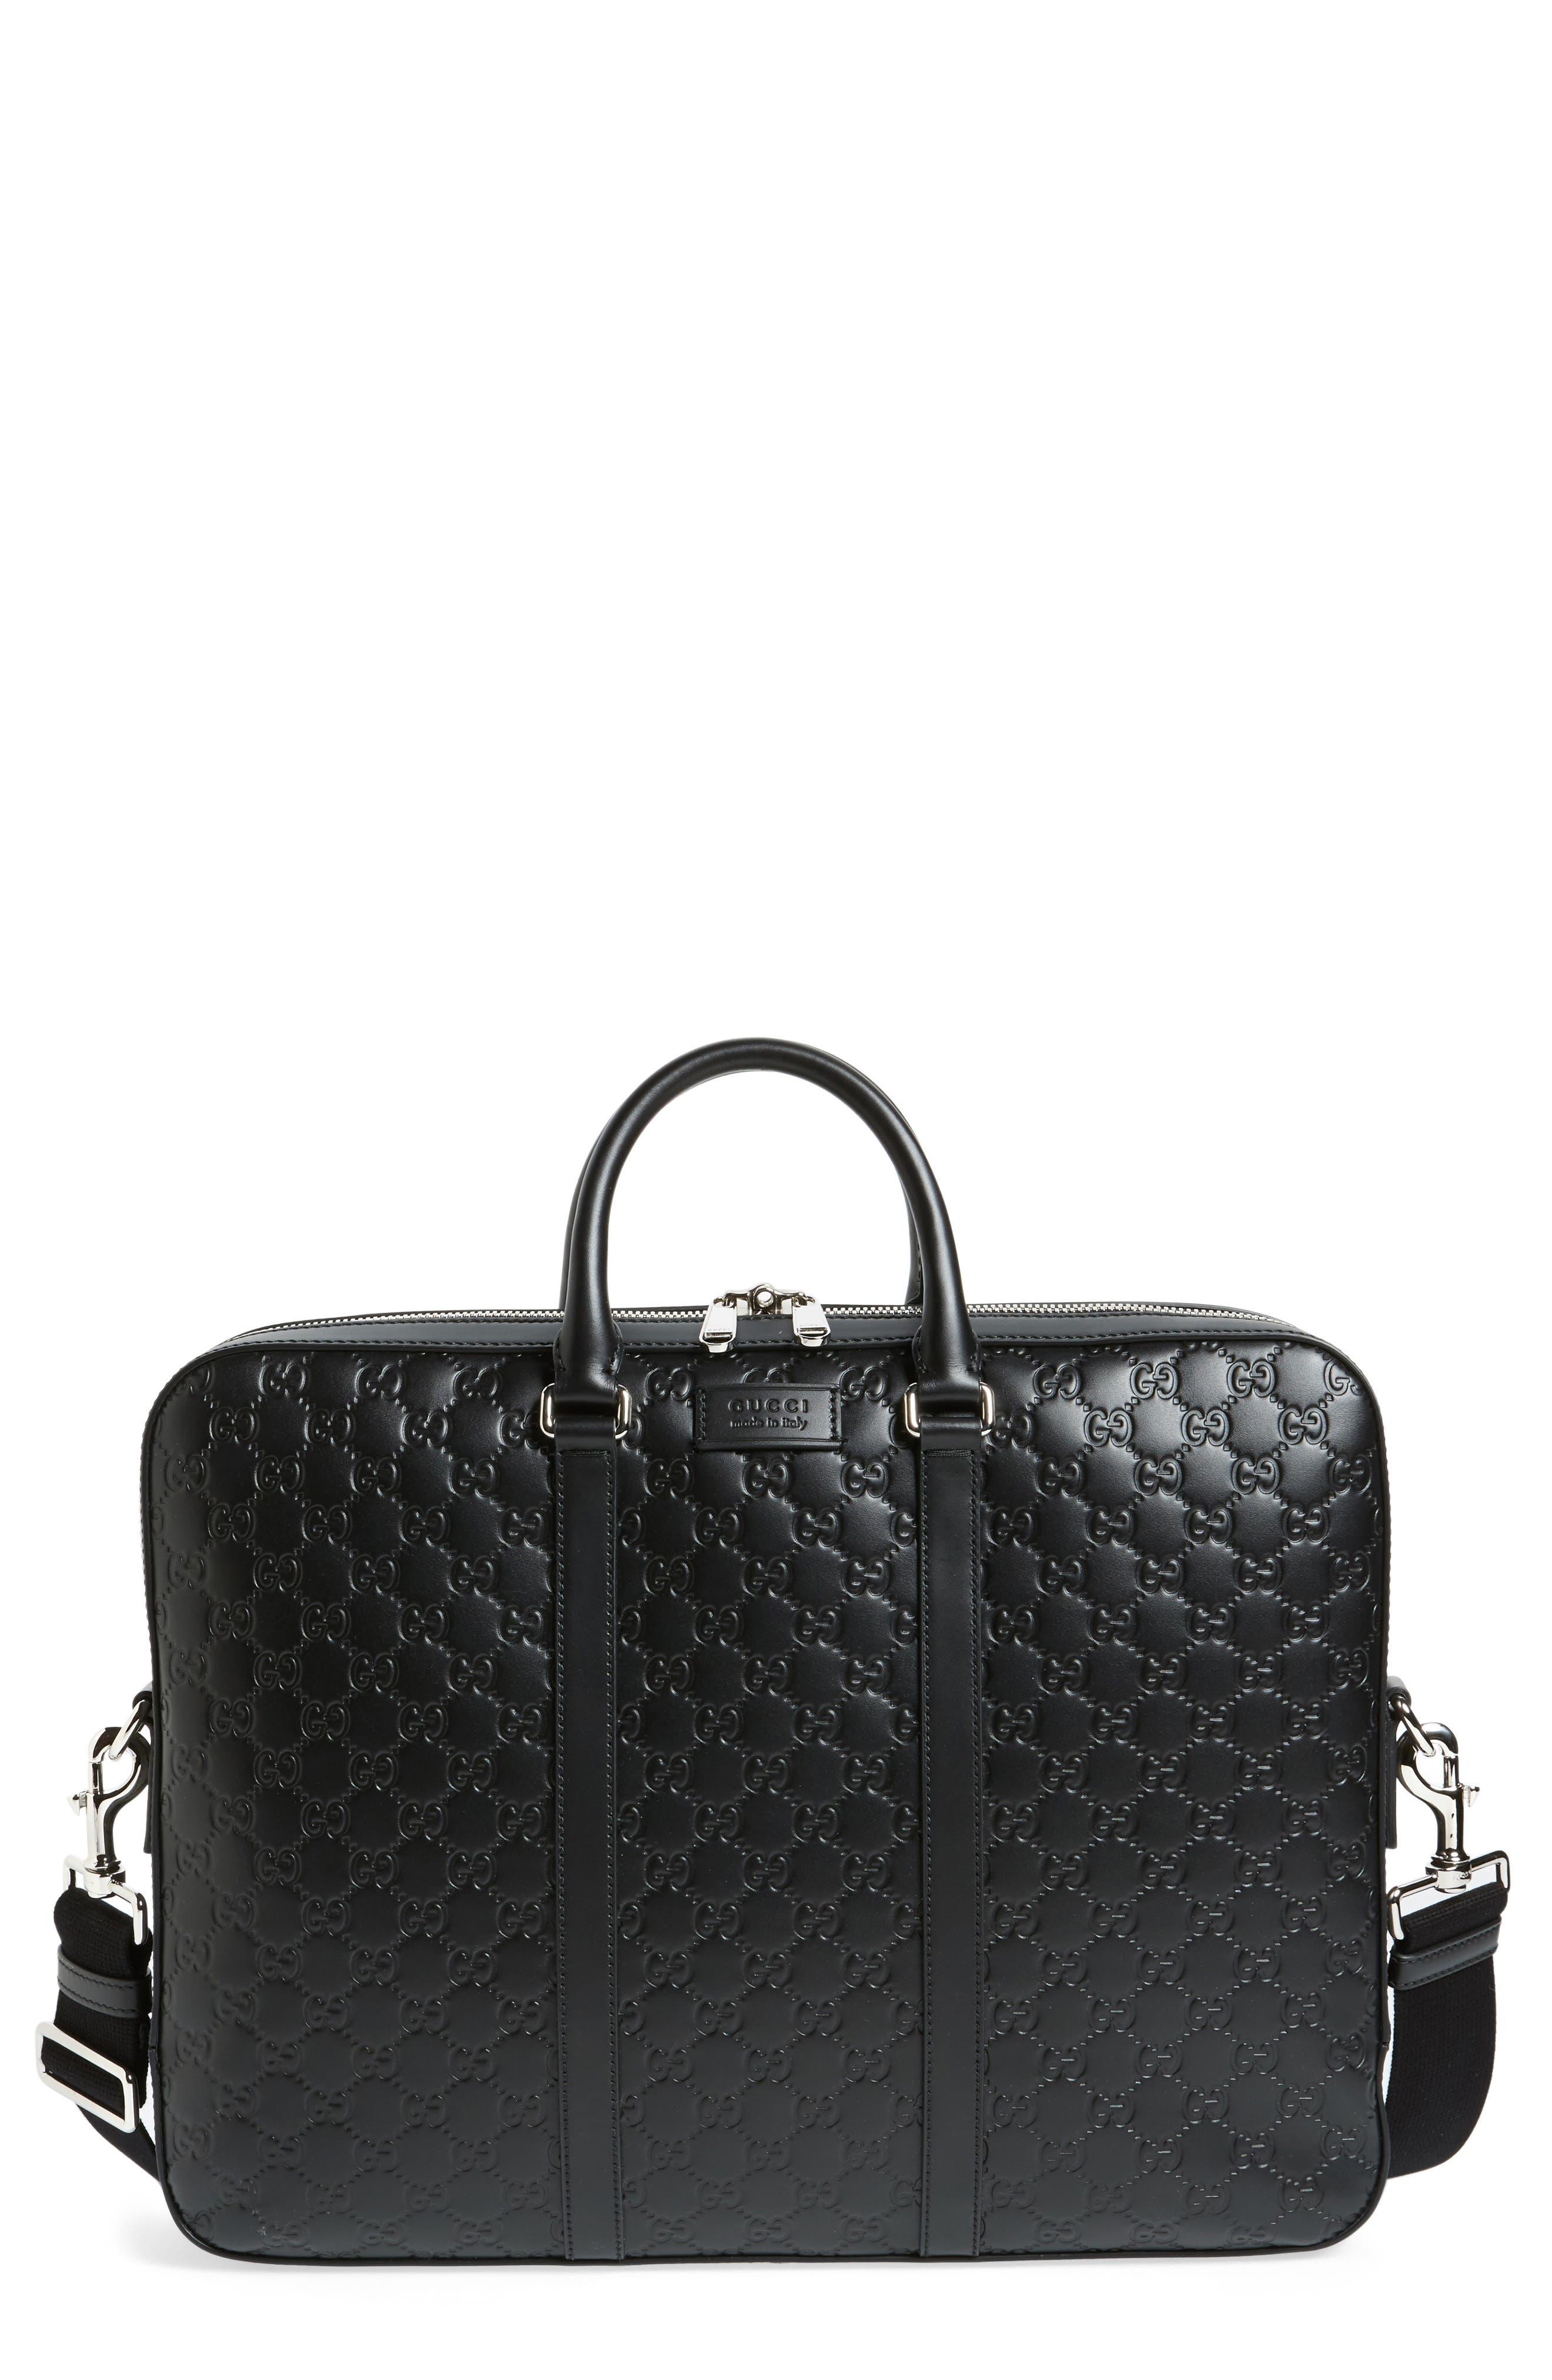 Main Image - Gucci Signature Leather Briefcase